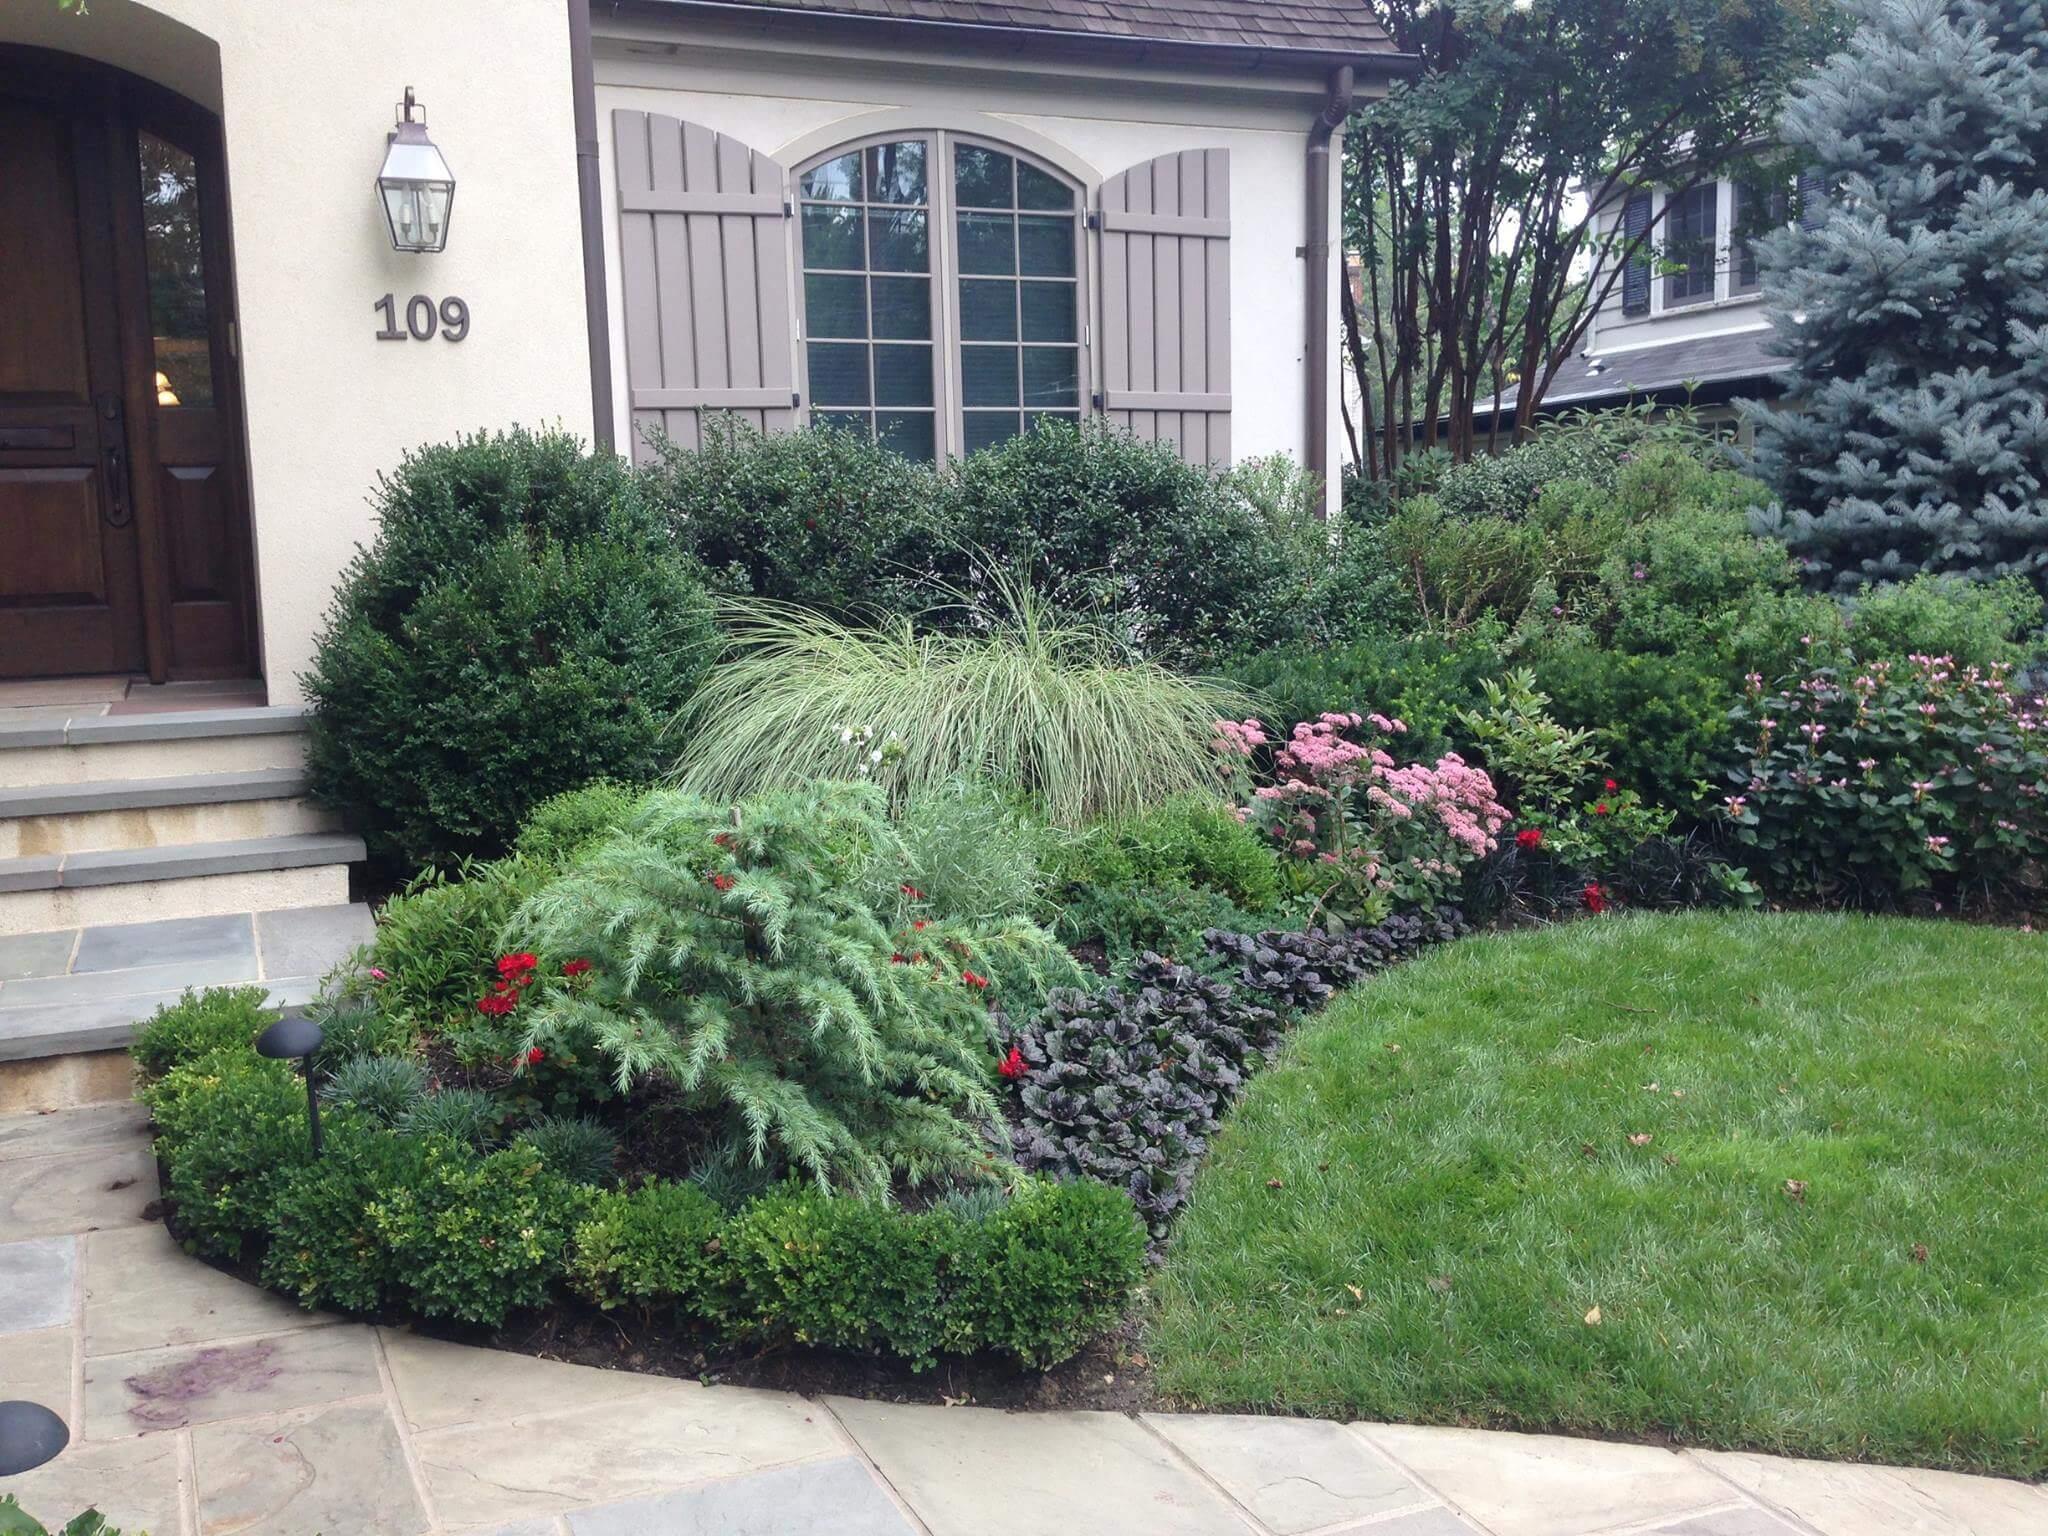 horticultural landscape maintenance & garden care